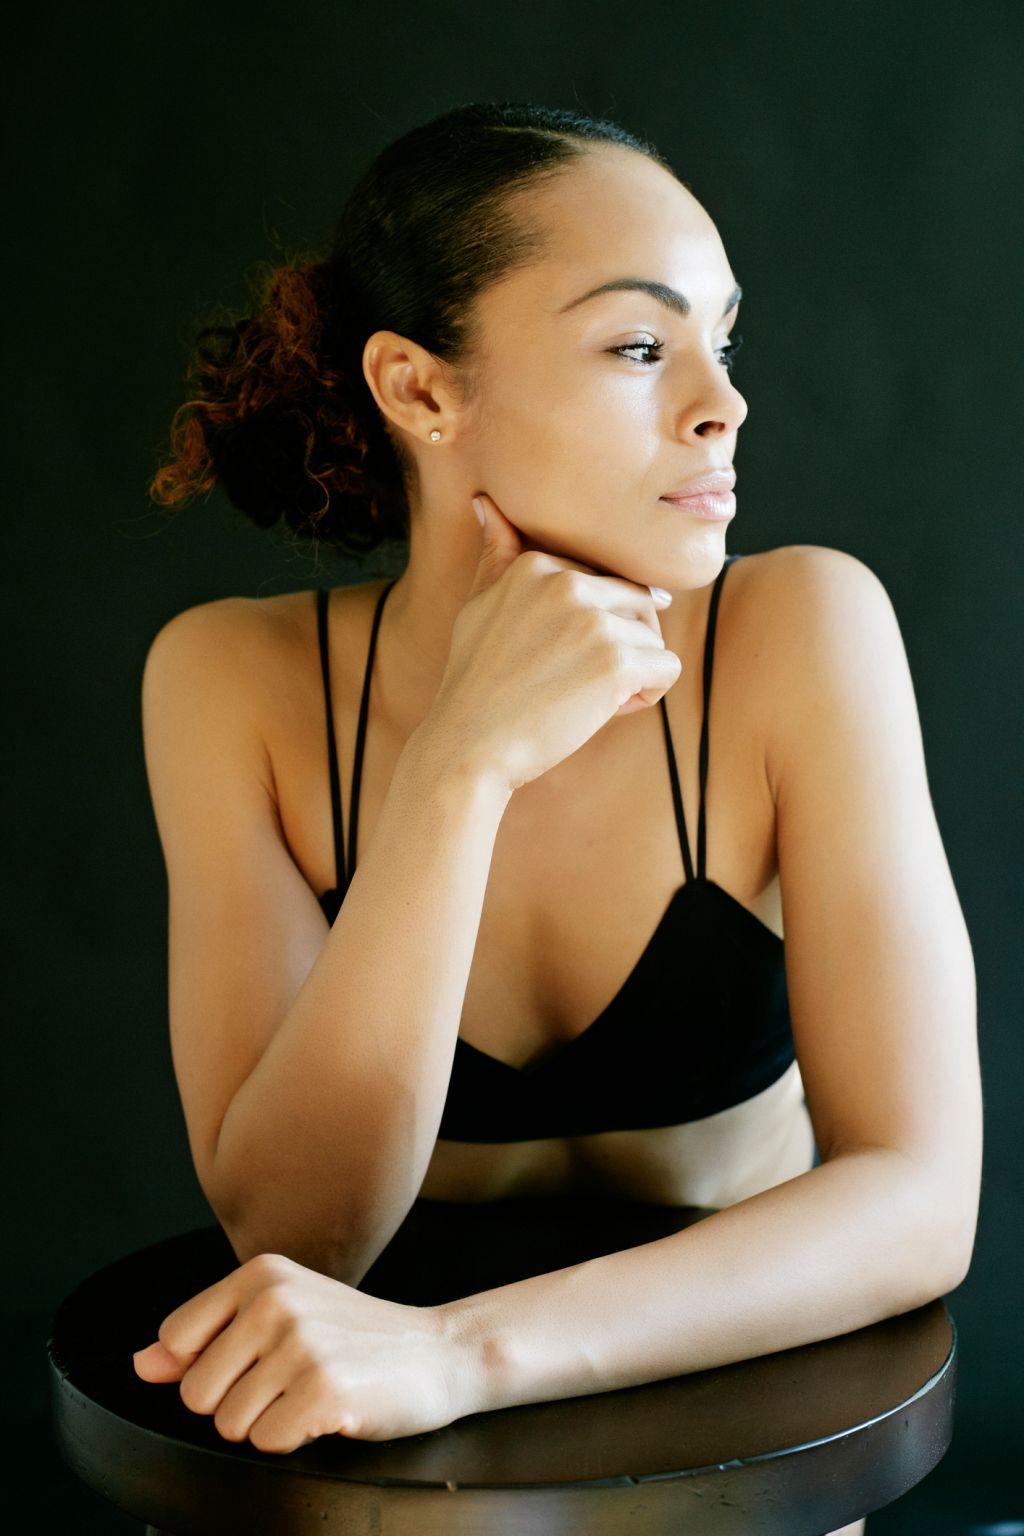 Pensive Mixed Race woman wearing bra leaning on stool